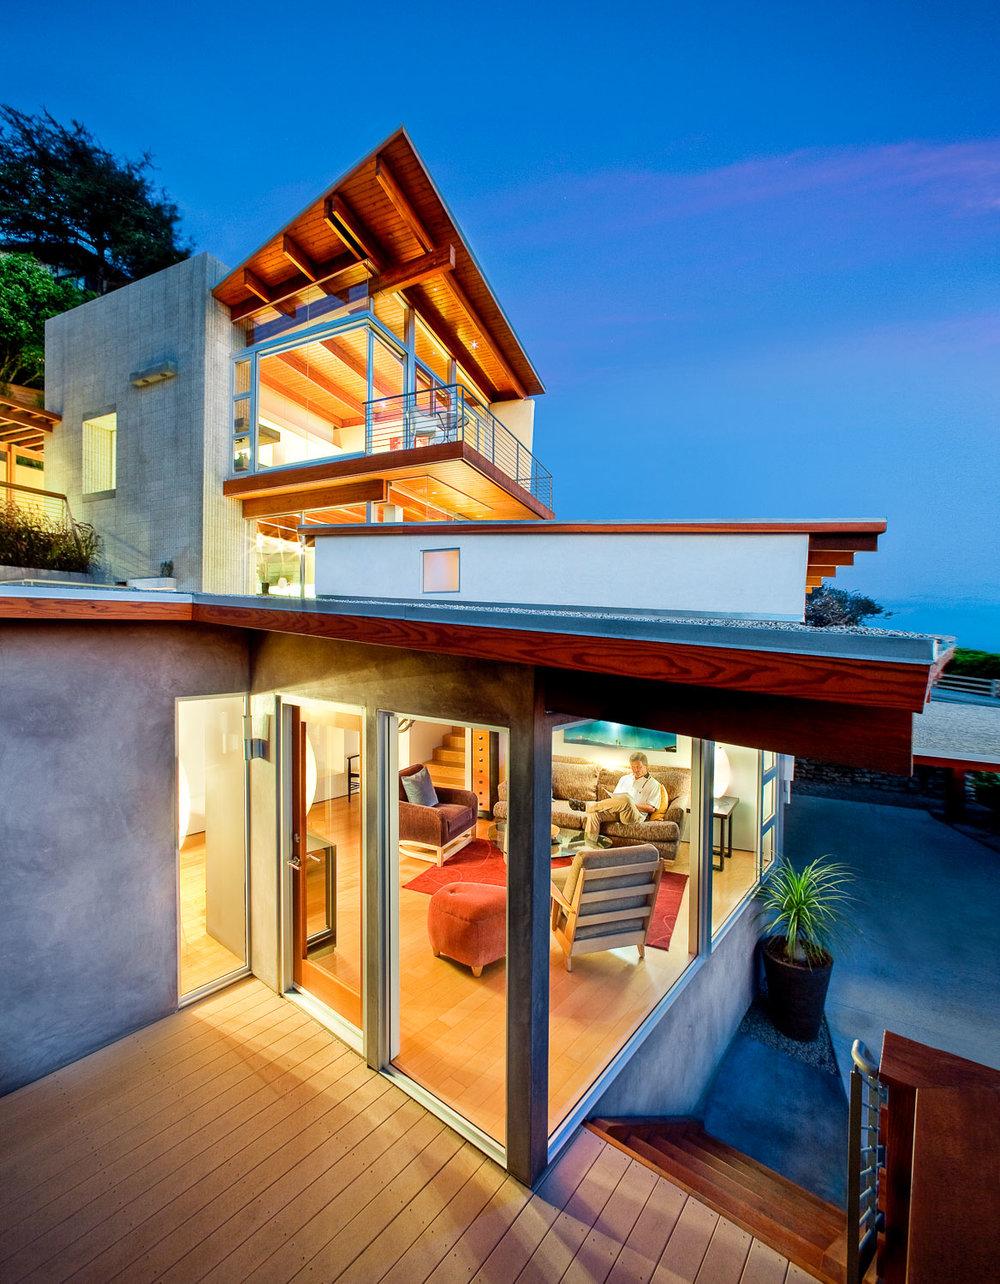 001 Laguna Beach Residence.jpg